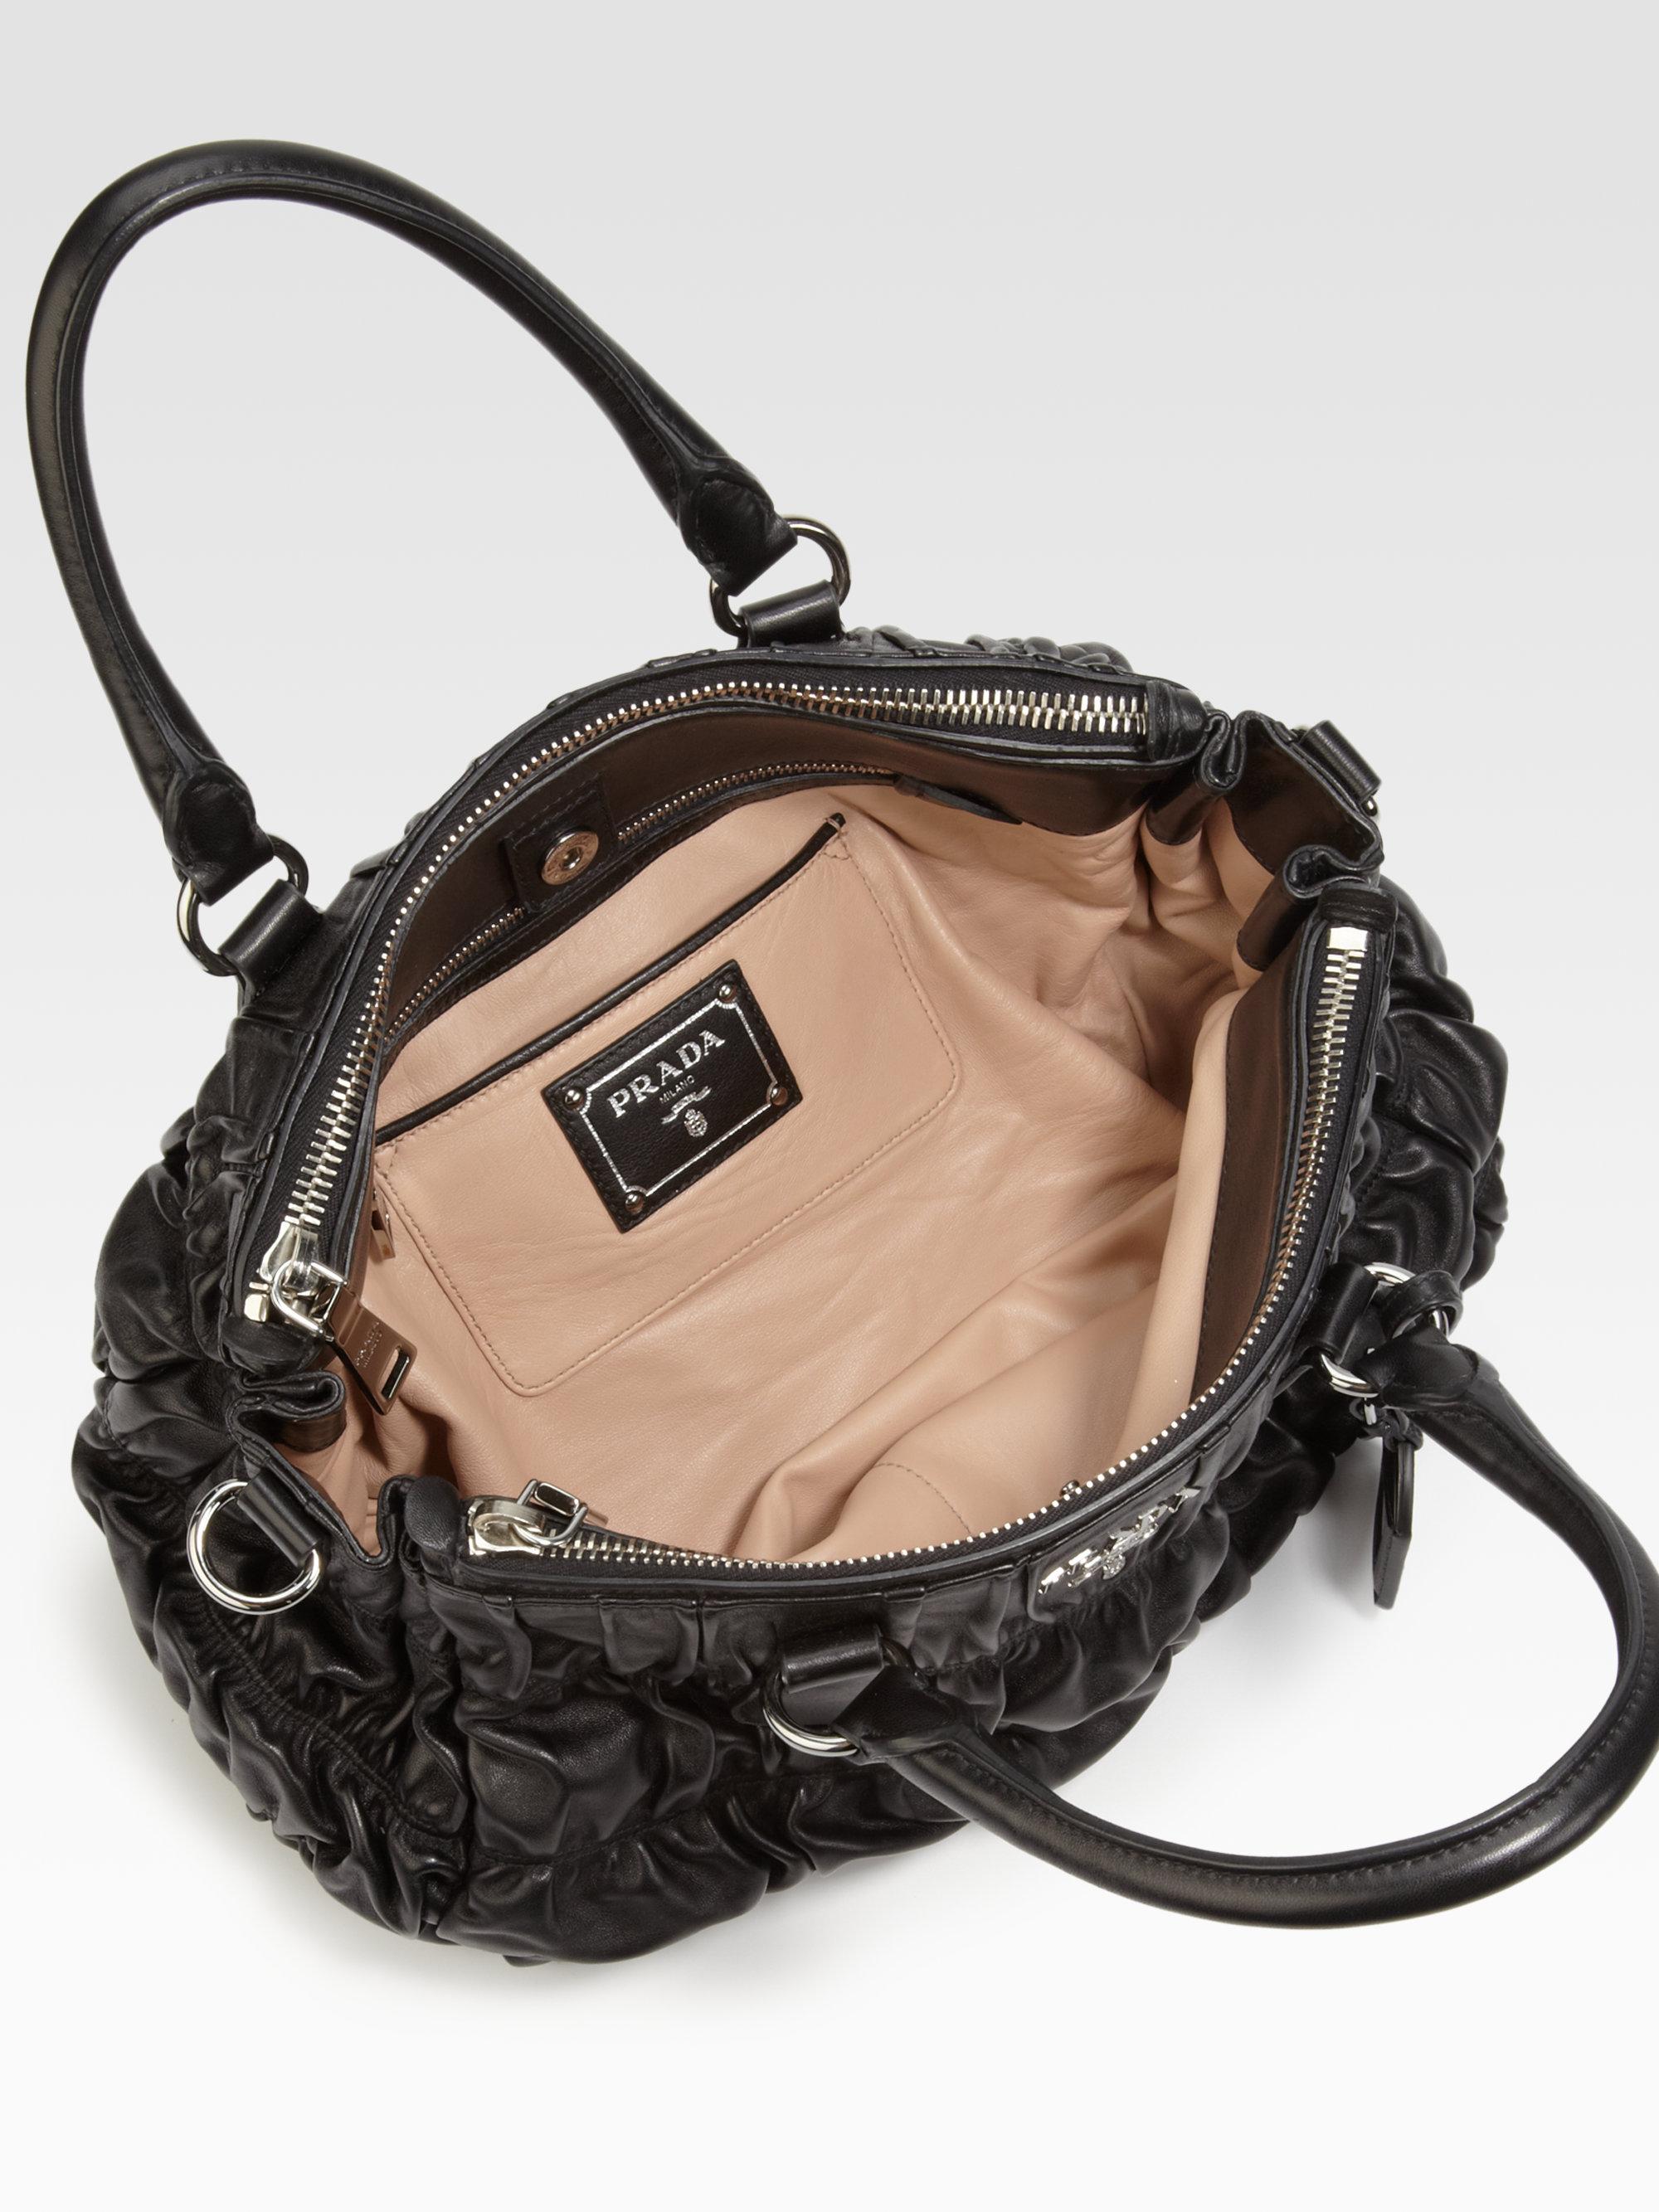 prada black leather shoulder bag - Prada Nappa Gaufre Ruched Leather Tote in Black | Lyst